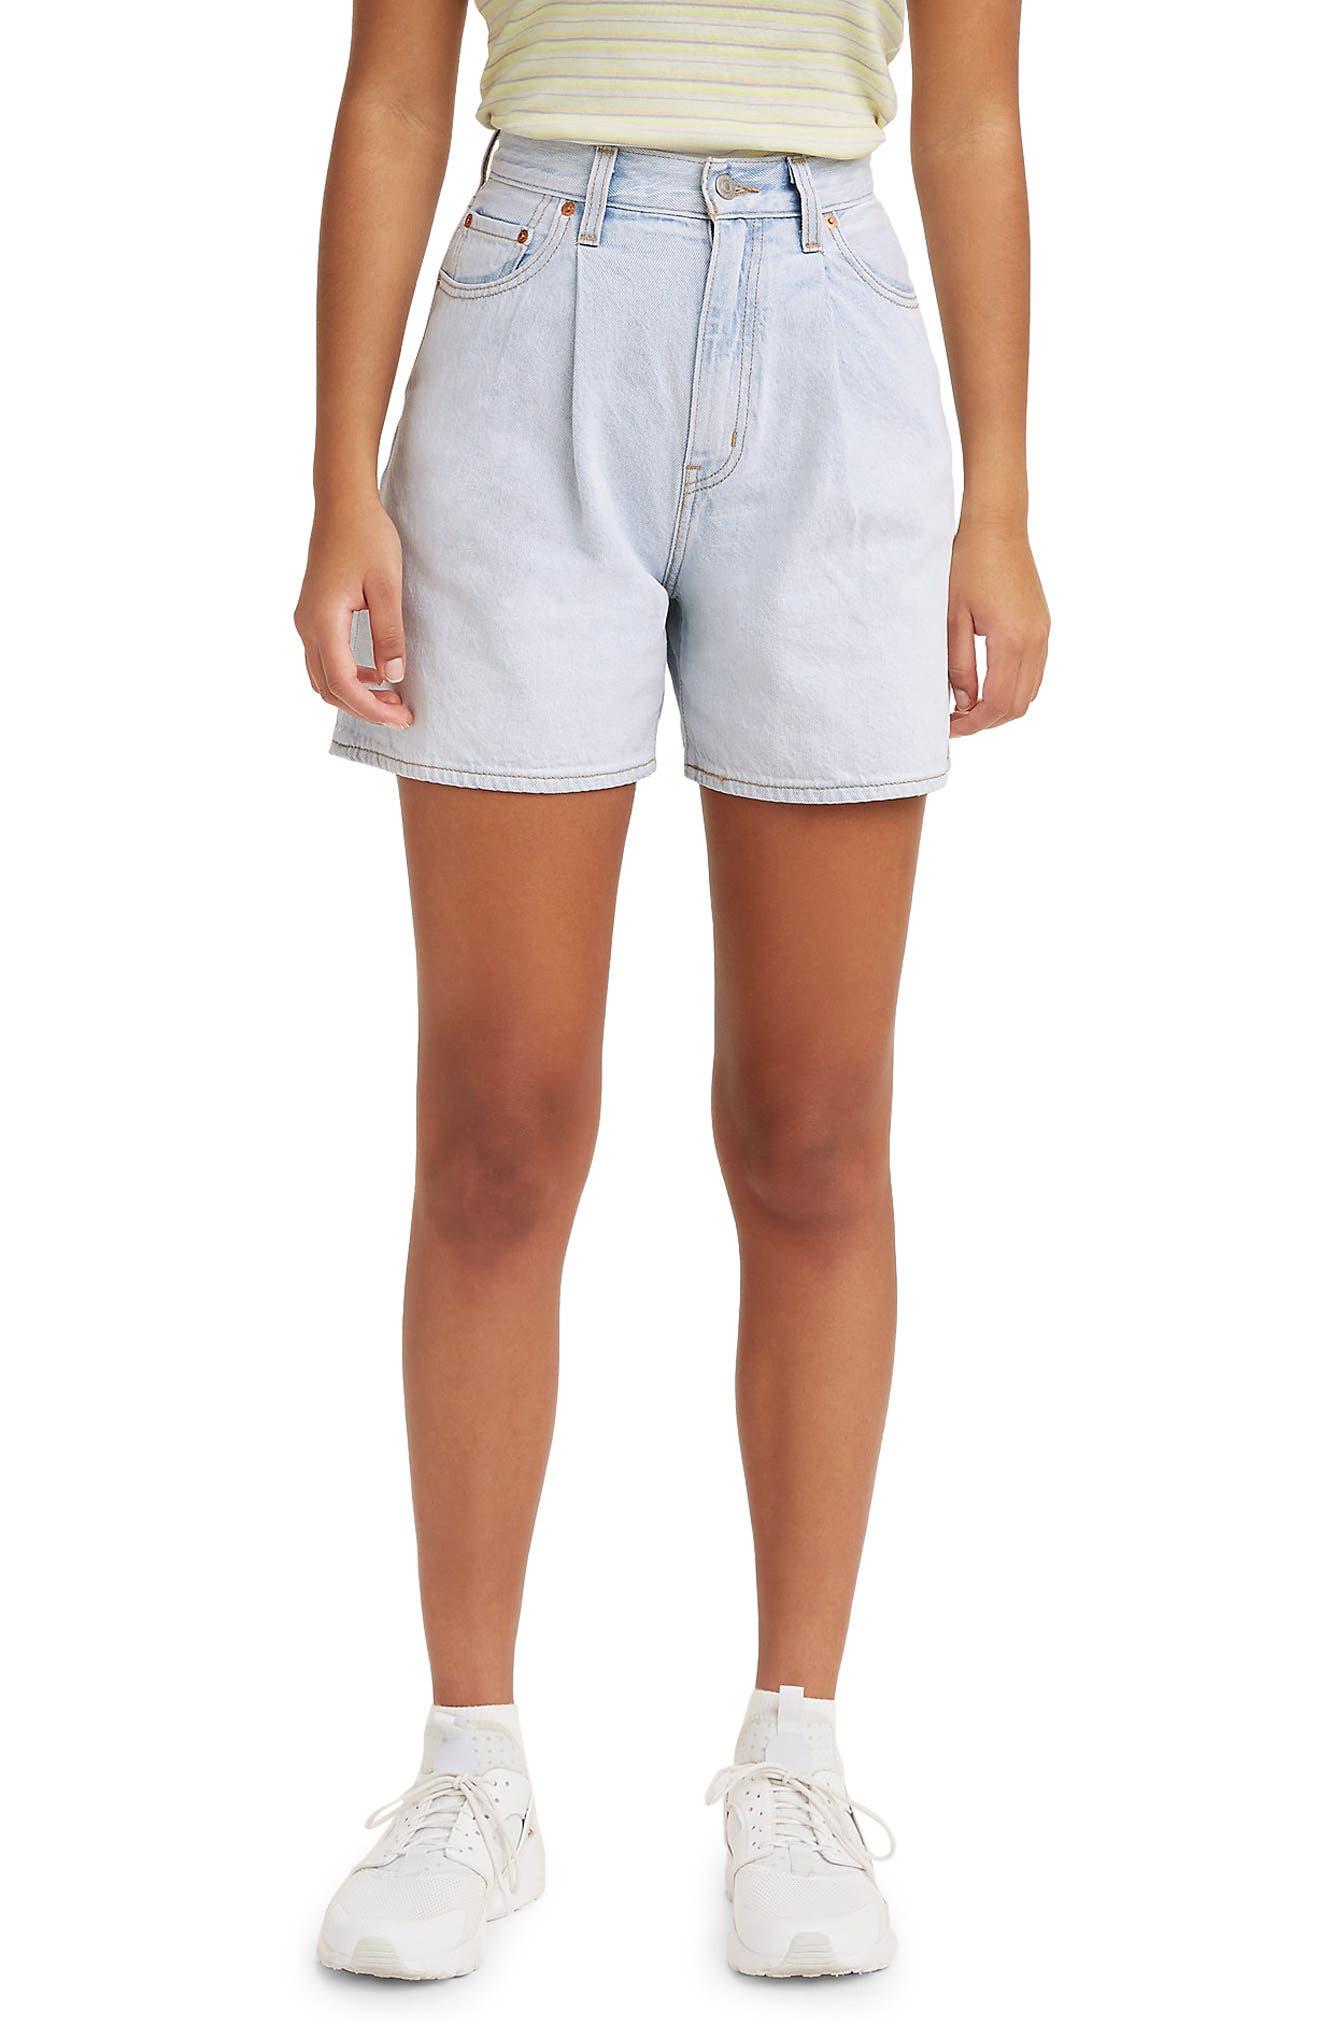 Vintage Shorts, Culottes,  Capris History Womens LeviS Pleated Ribcage Denim Shorts Size 29 - Blue $79.50 AT vintagedancer.com